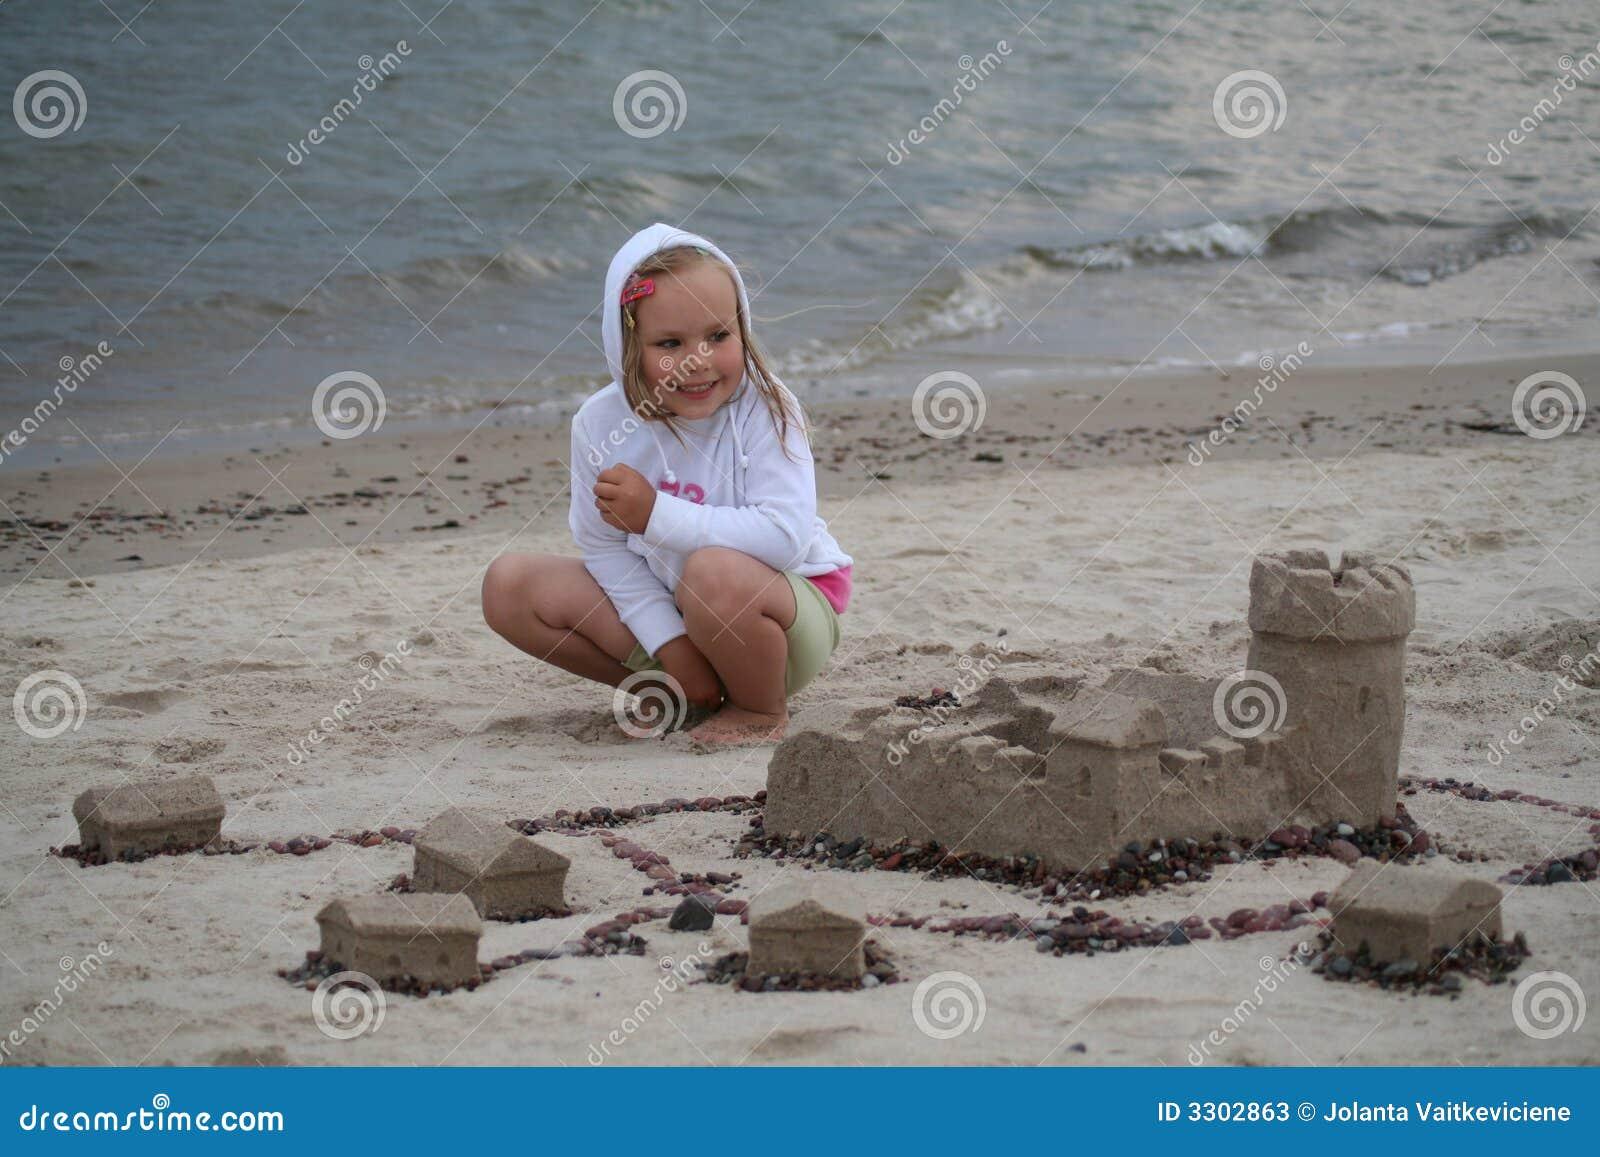 Construtor do castelo da areia